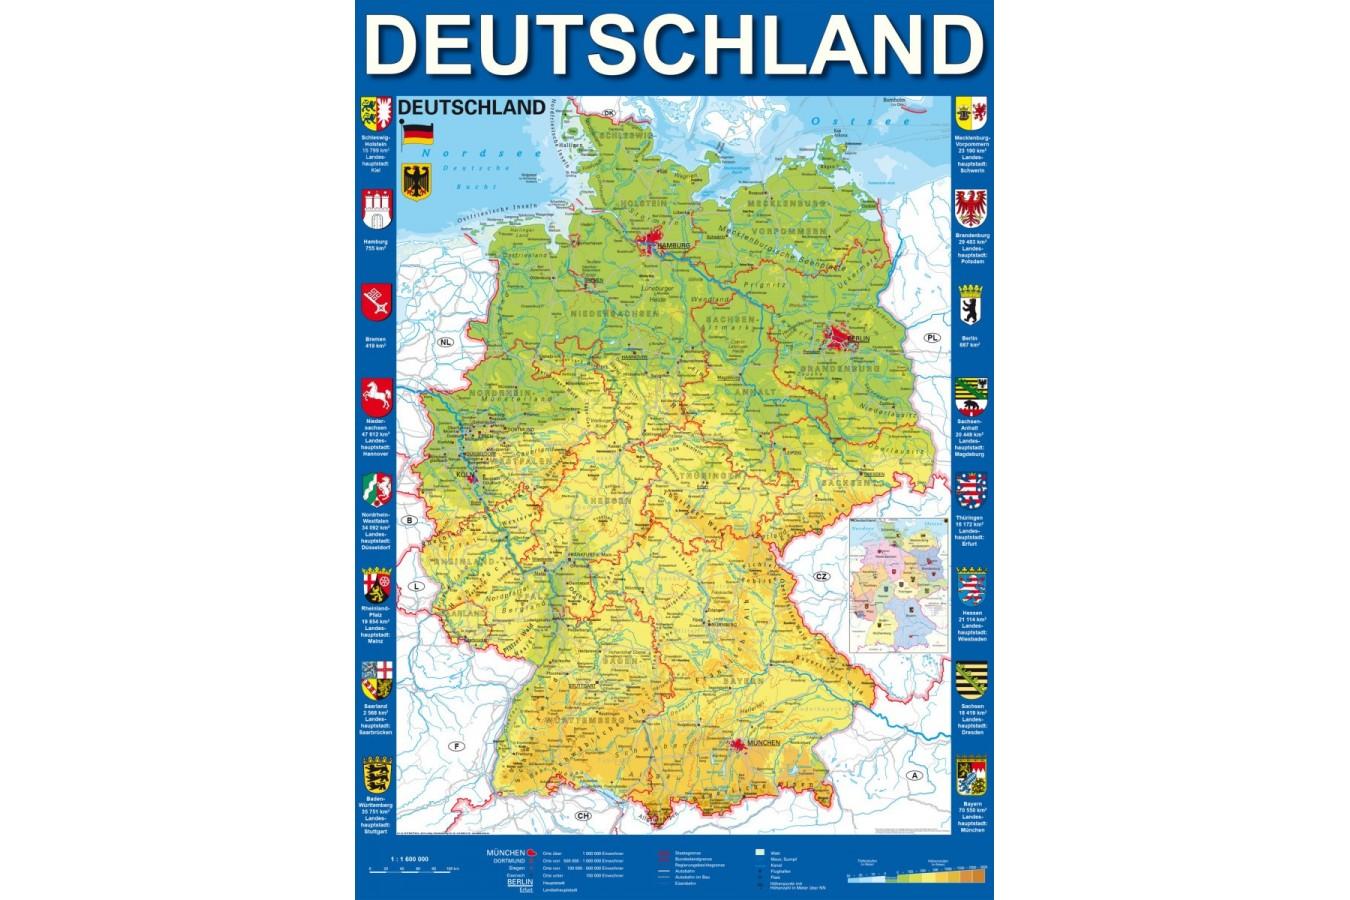 Puzzle Schmidt Harta Germaniei 1 000 Piese 58287 We Puzzle